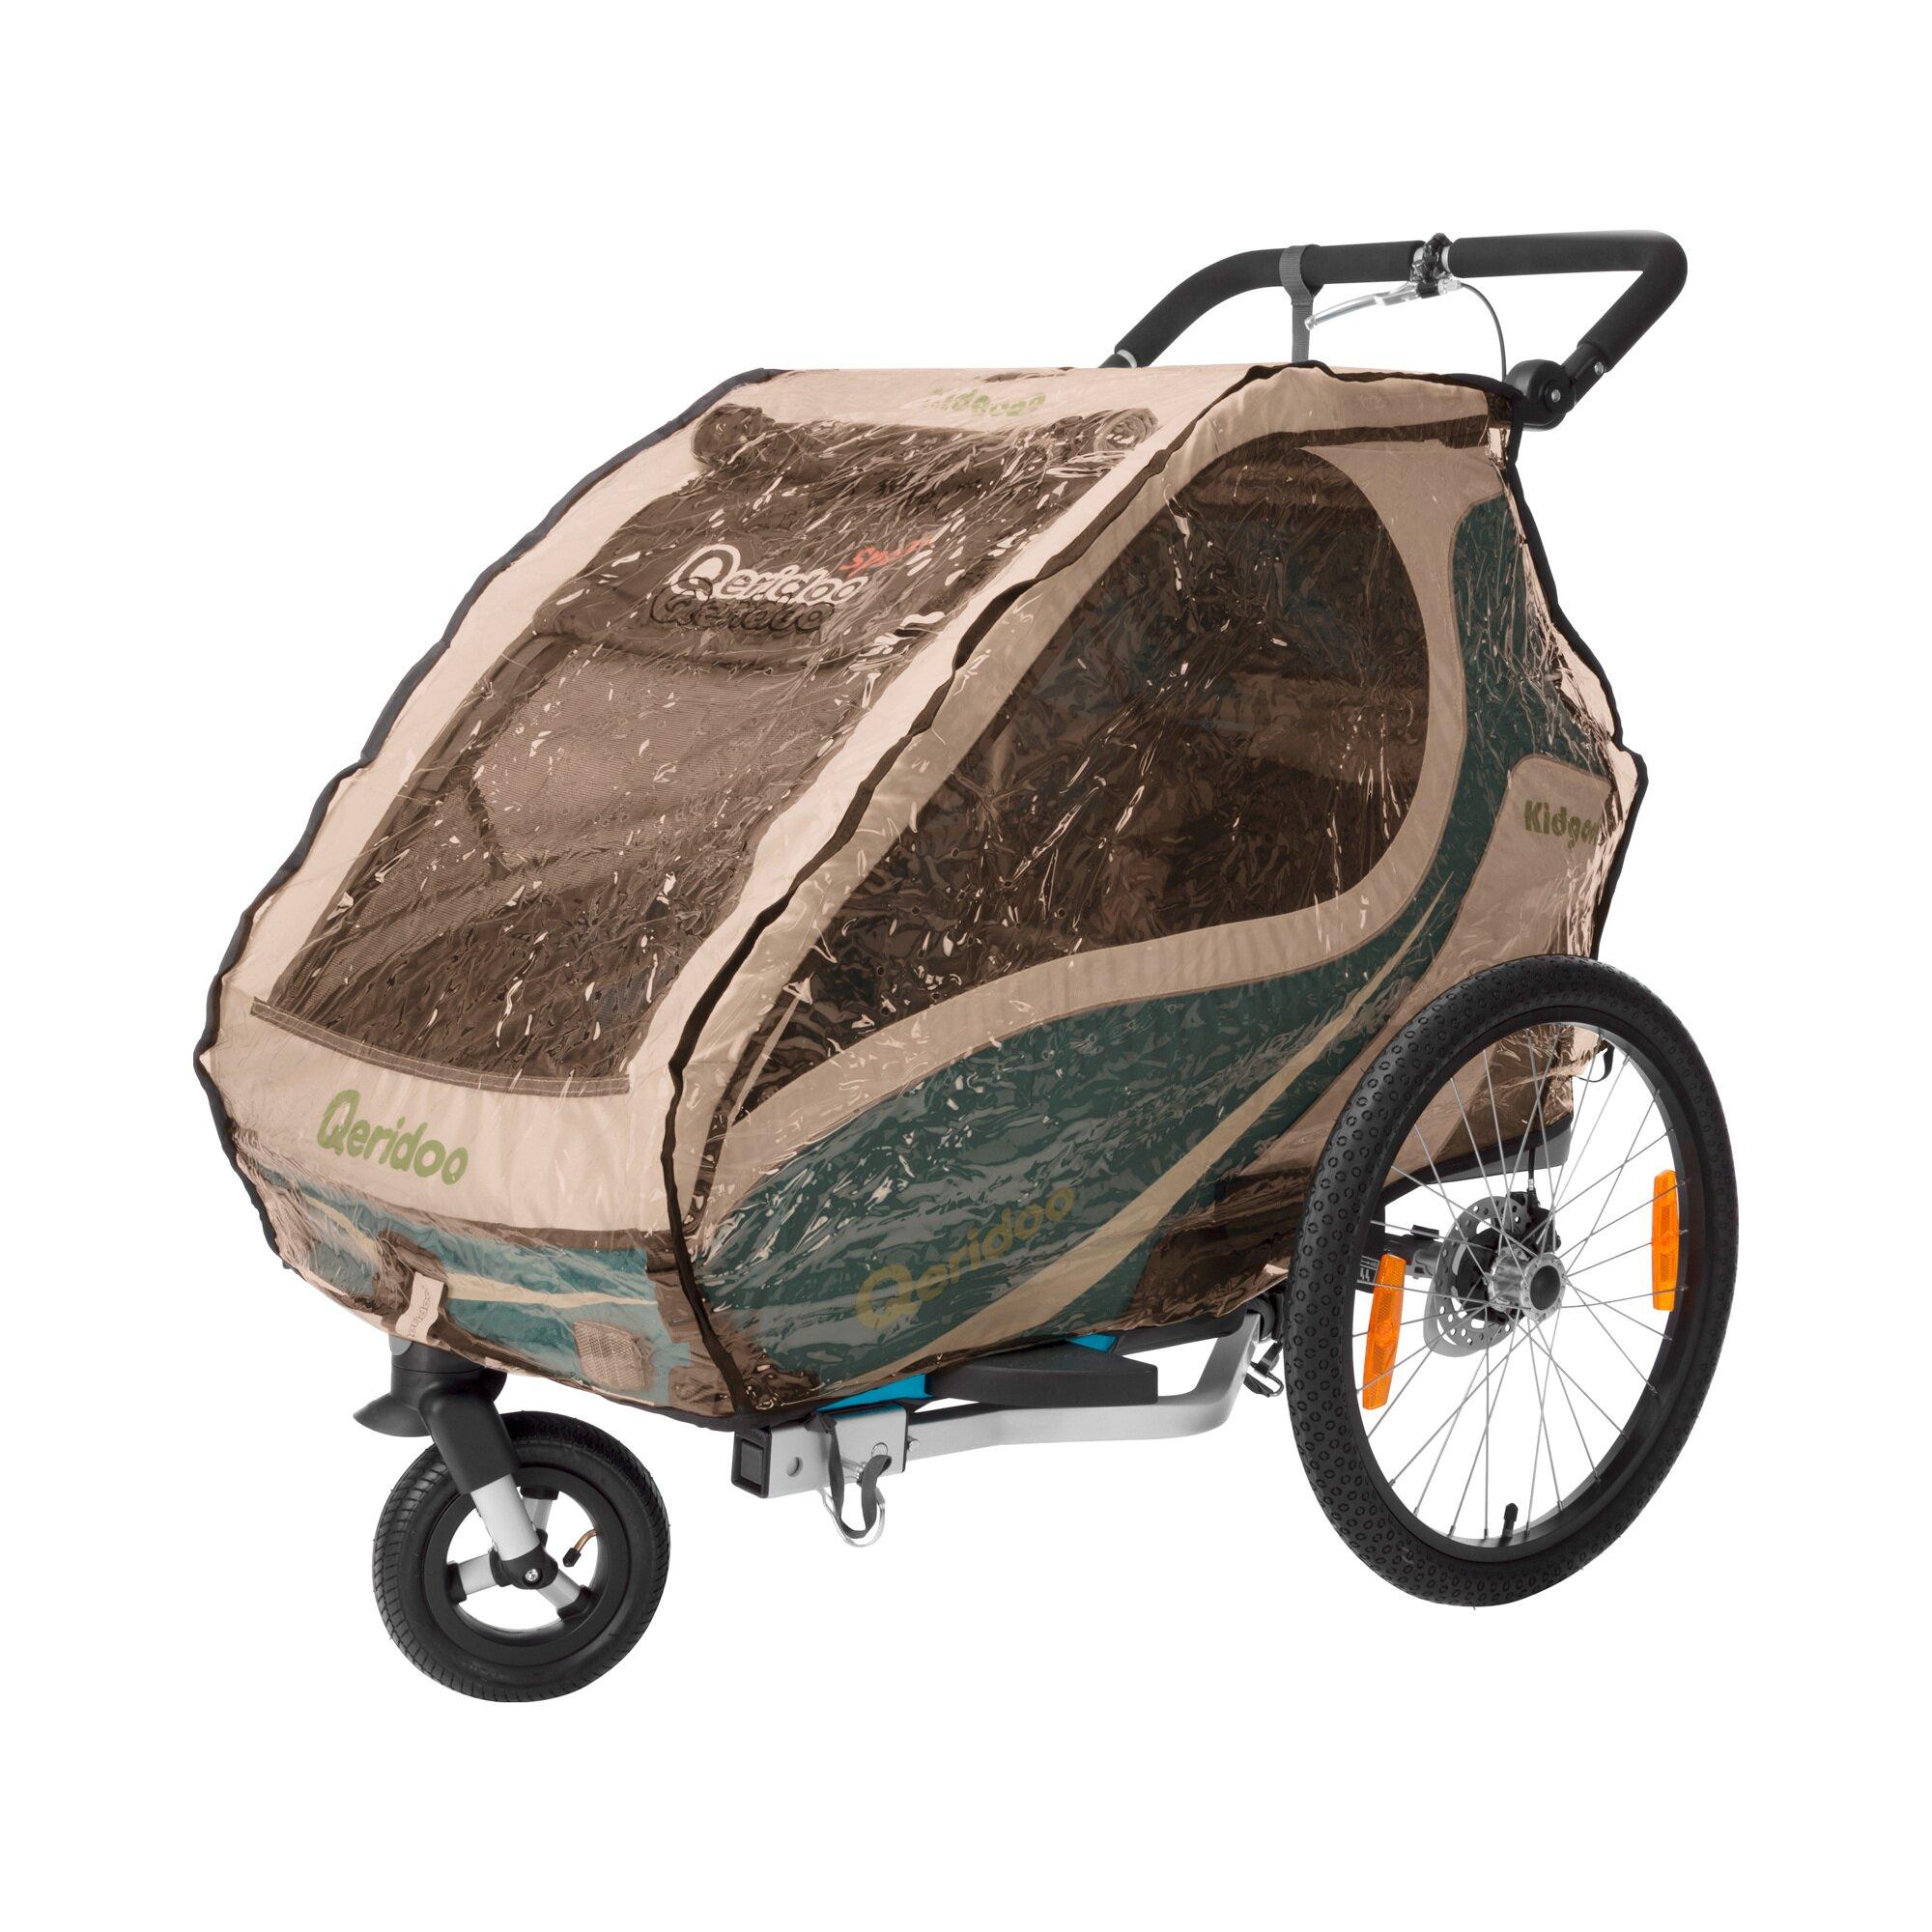 Qeridoo Regenschutz für Kinderfahrradanhänger Kidgoo1